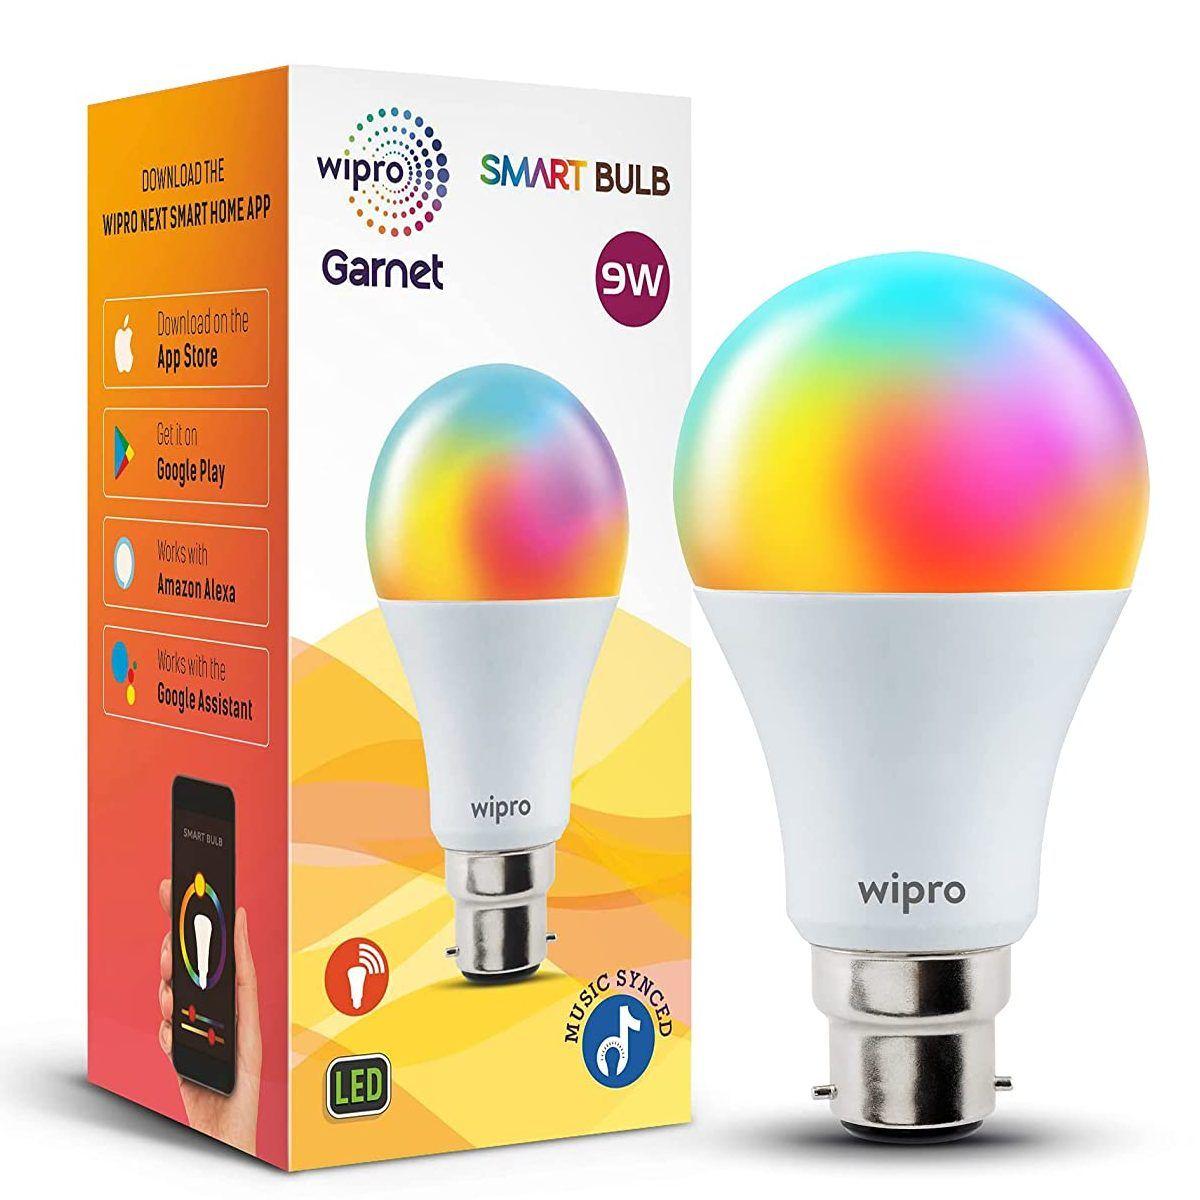 wipro 9-Watt B22 WiFi Smart LED Bulb